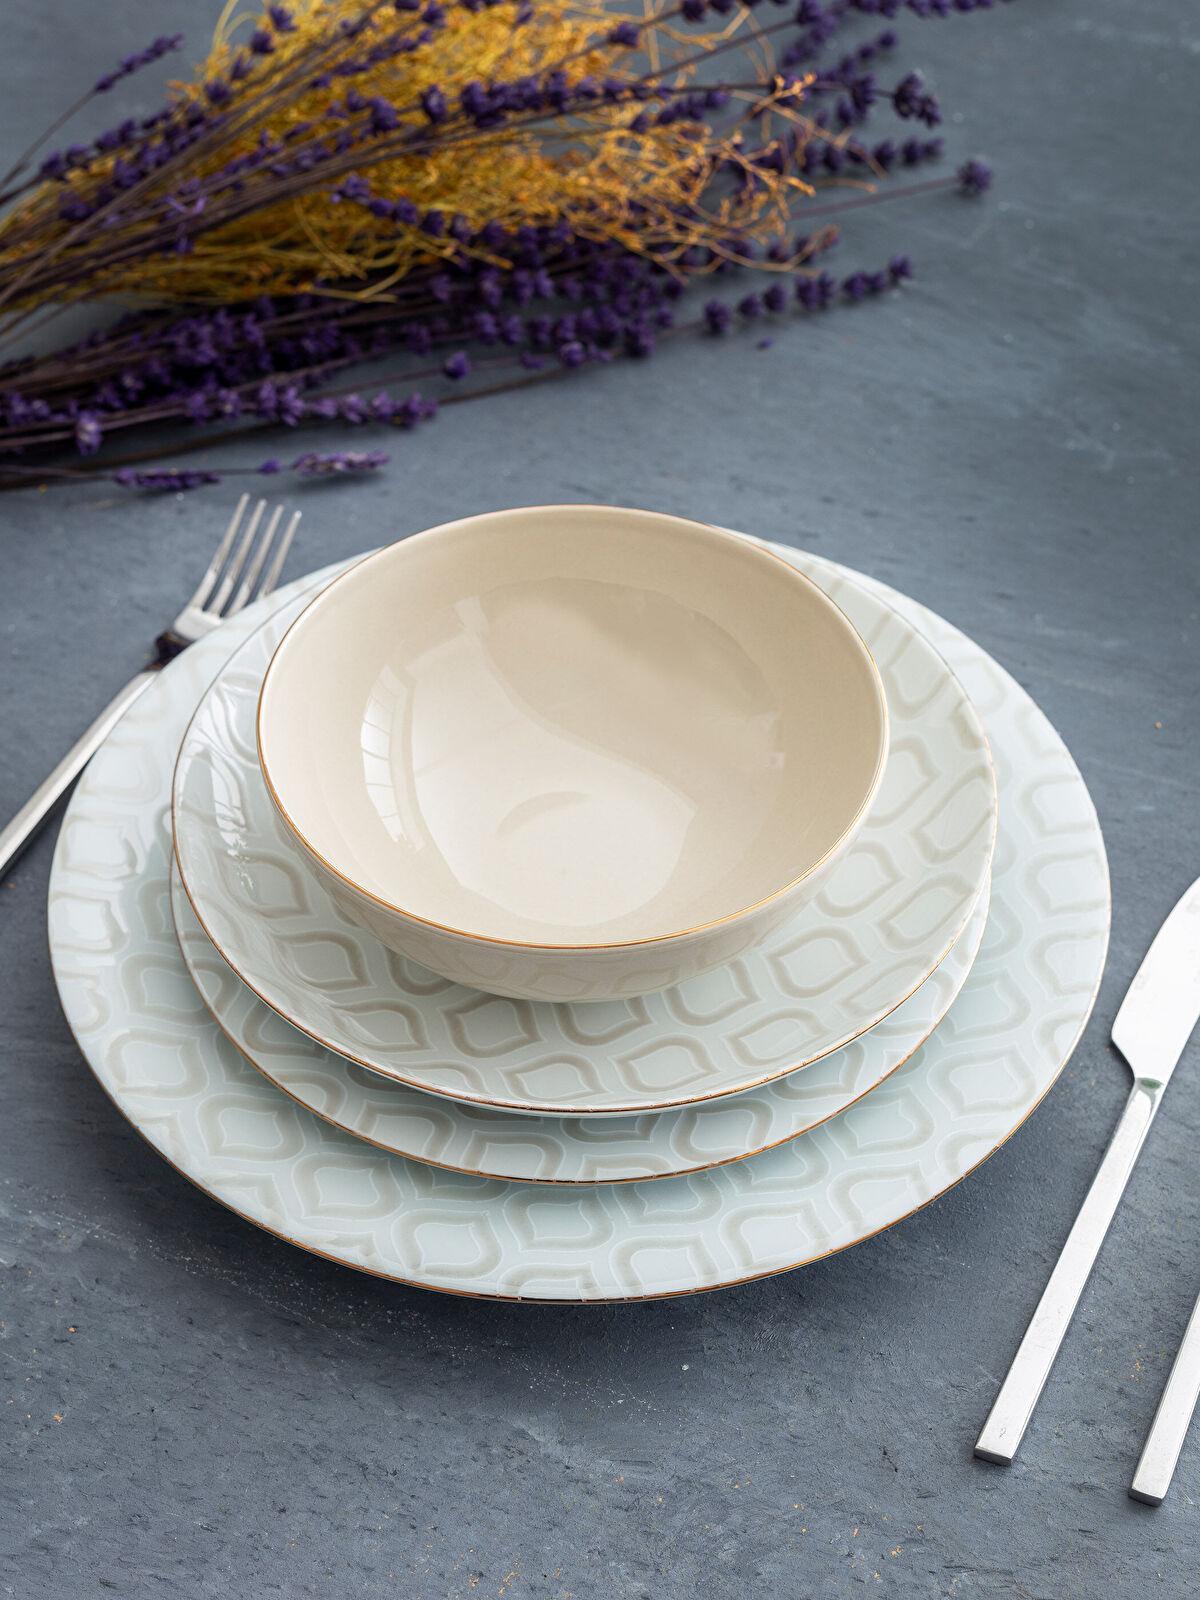 Kütahya Porselen 24 Parça Yemek Takımı - LCW HOME